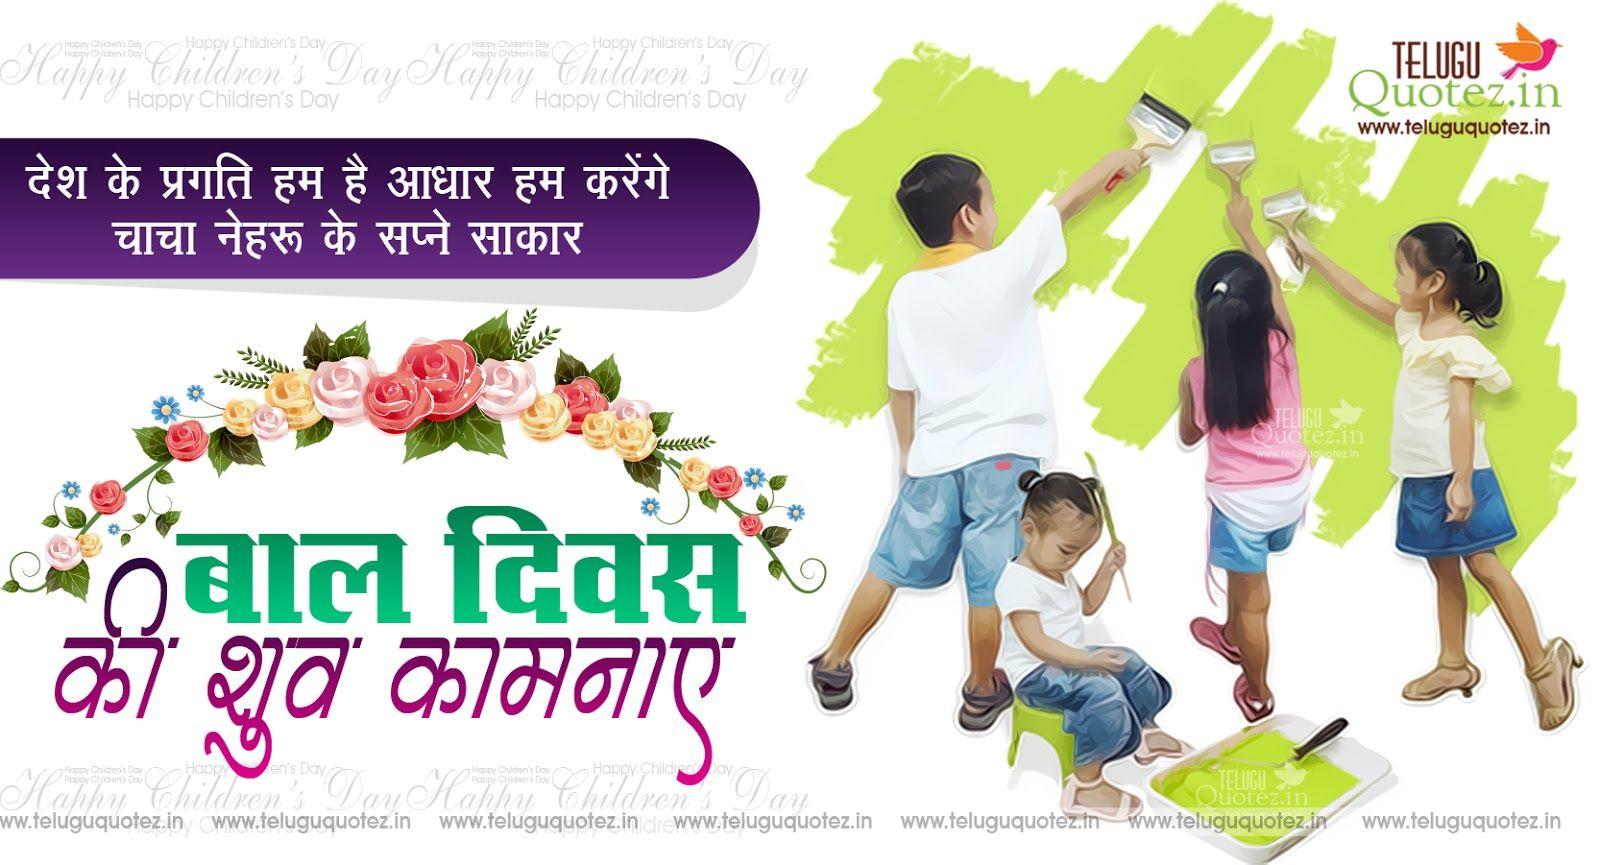 Happy Childrens Day Hindi Shayari Quotes And Sayings Happy